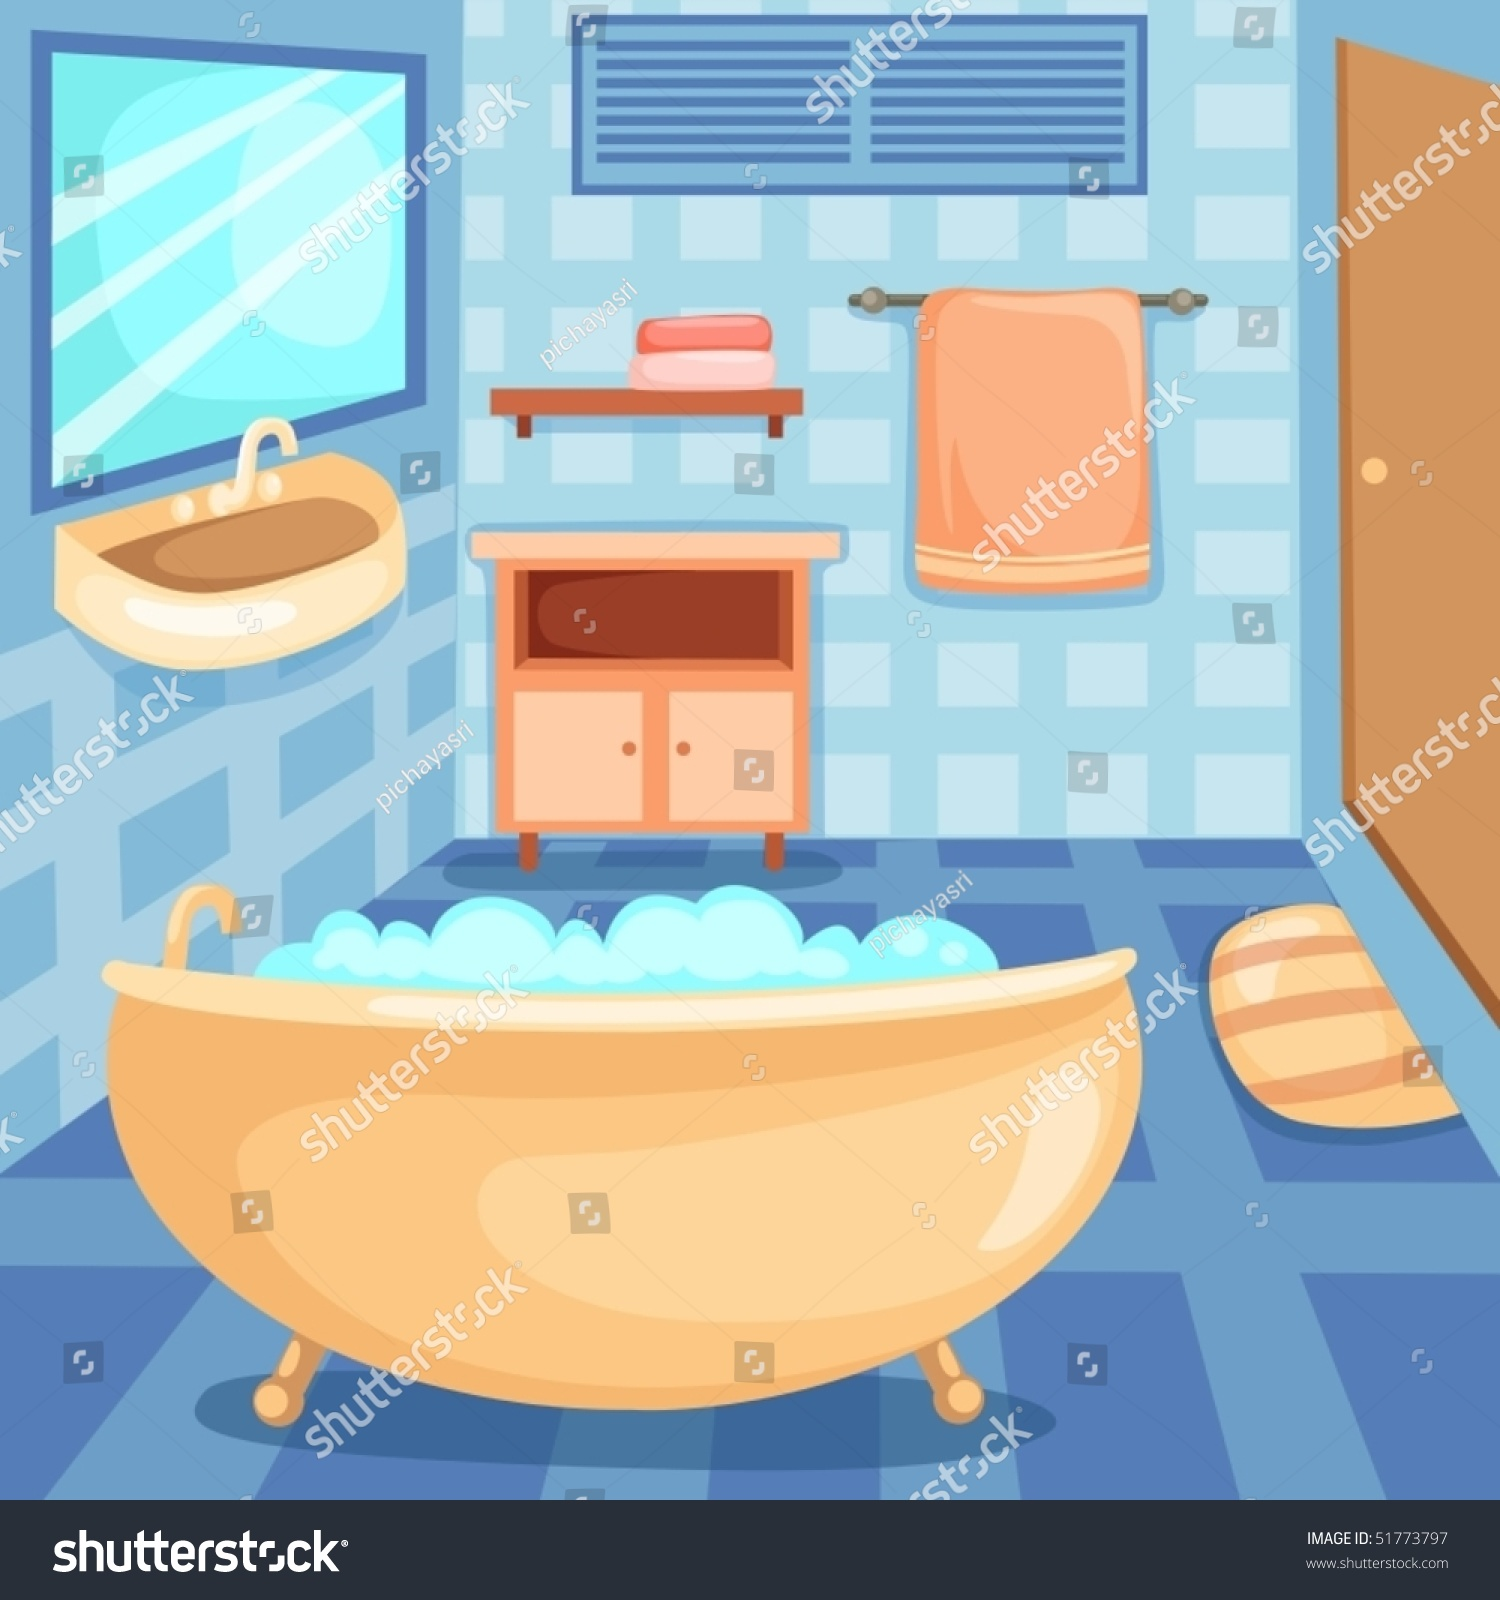 Illustration Of Cartoon Interior Of A Bathroom - 51773797 ...